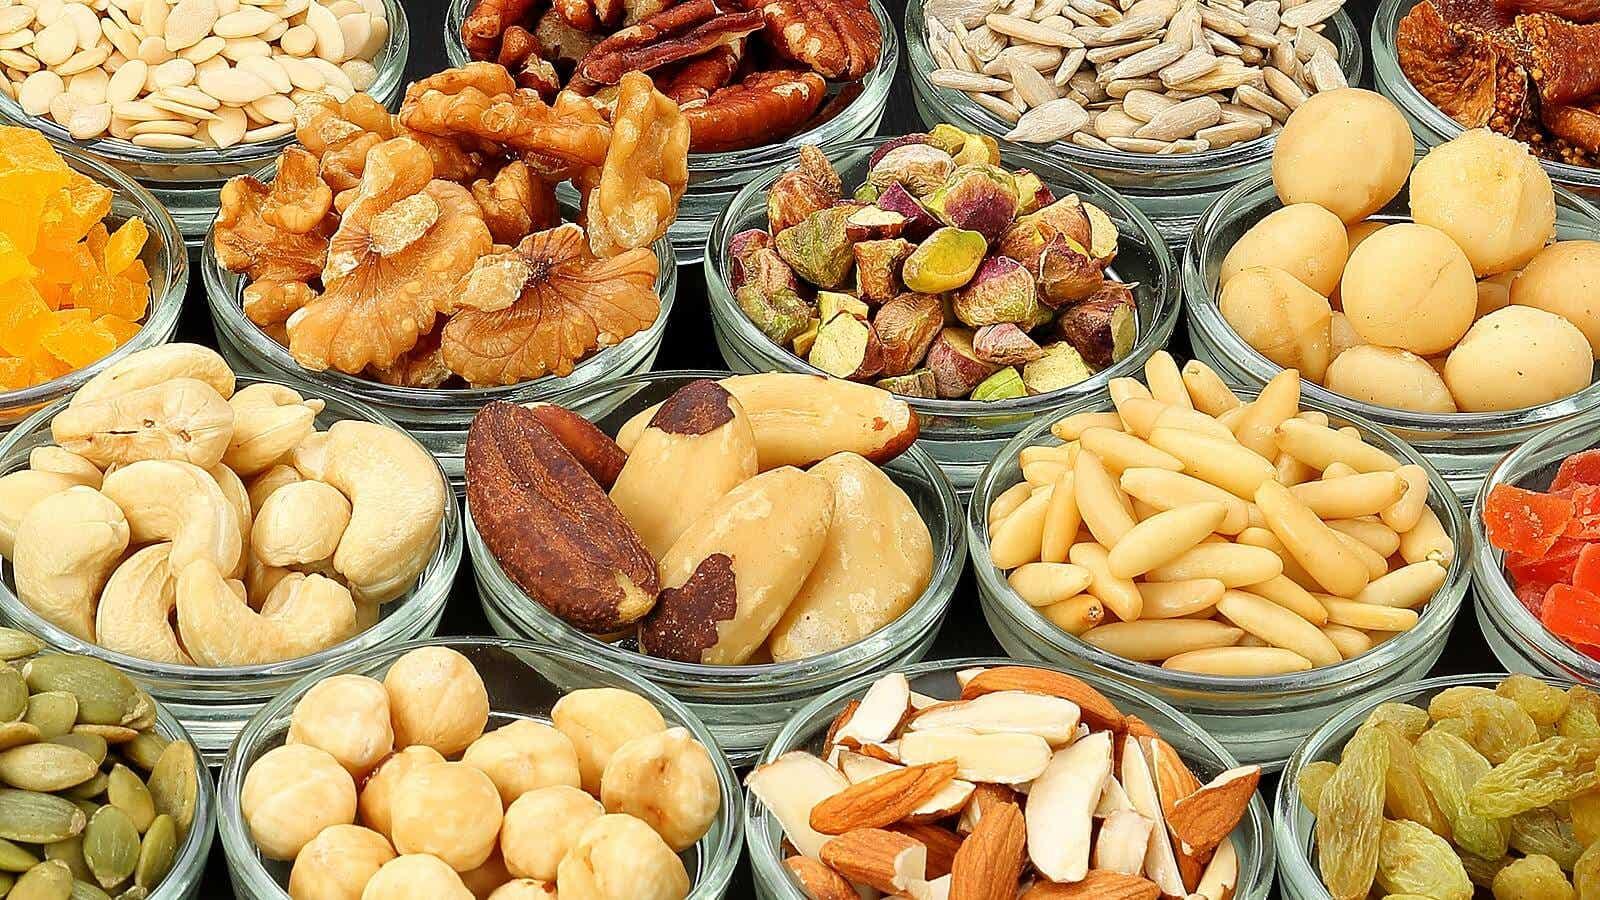 Nuts consumption.